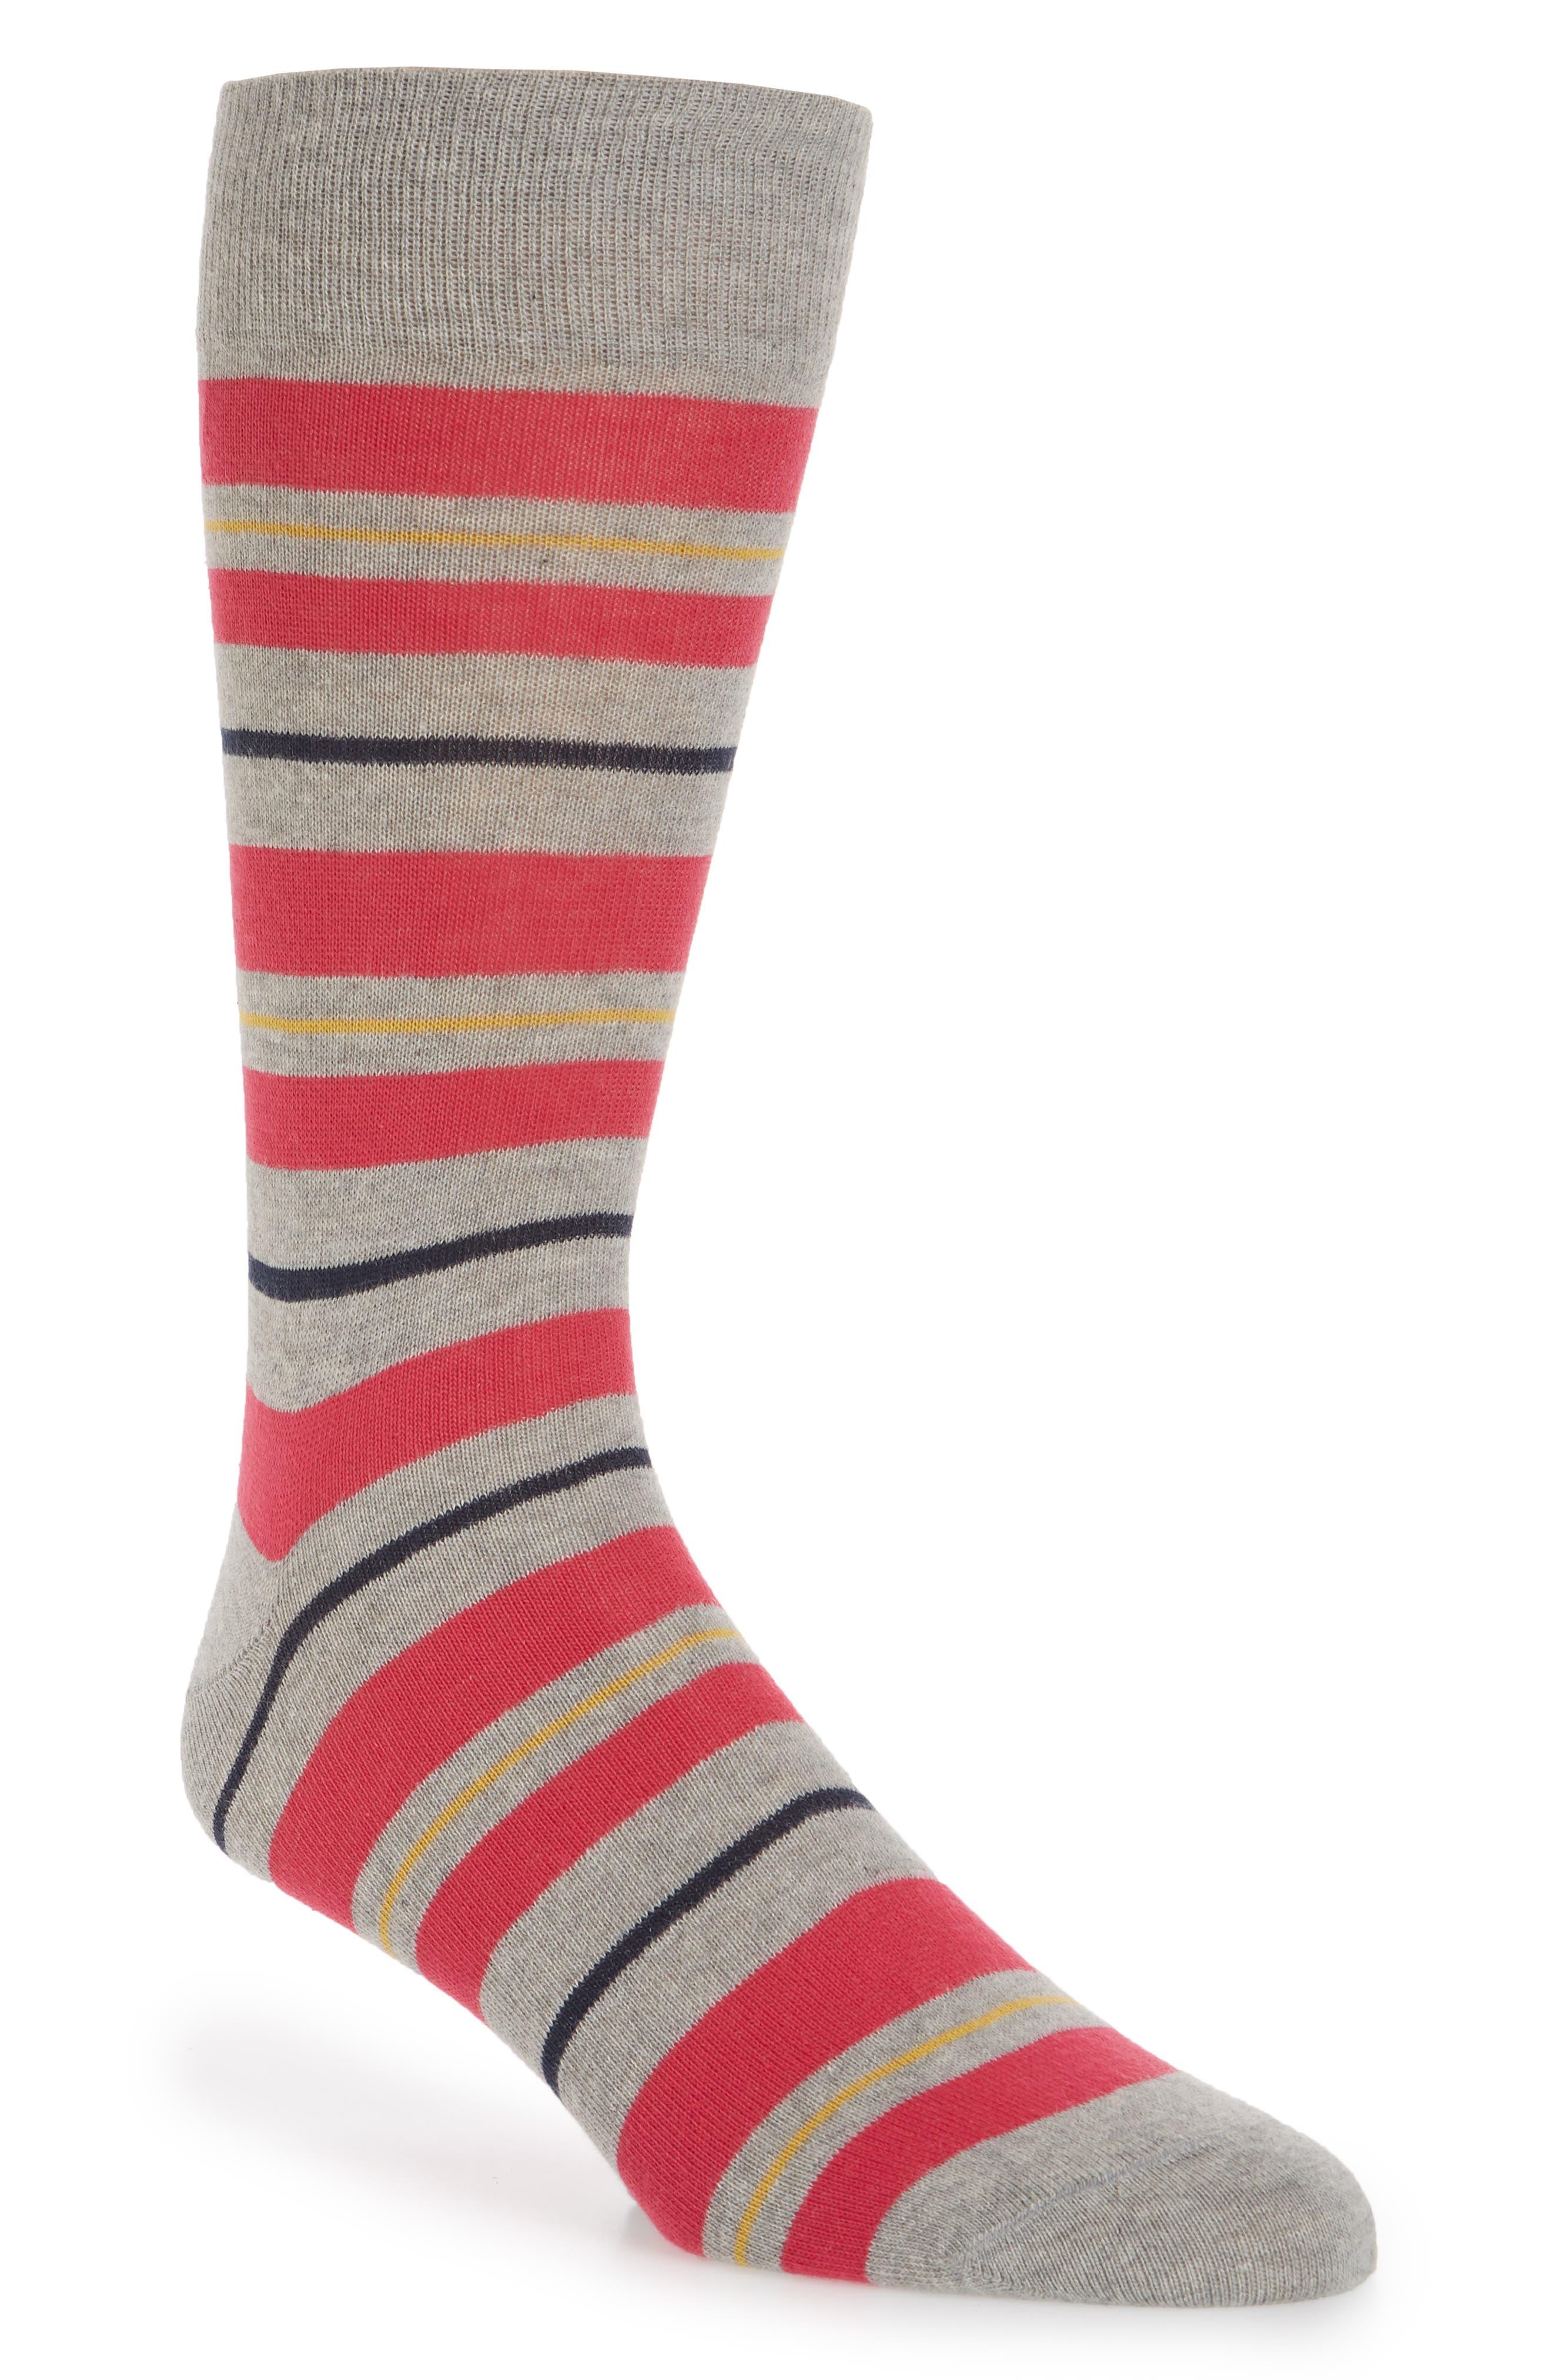 Uneven Stripe Socks,                             Main thumbnail 1, color,                             020